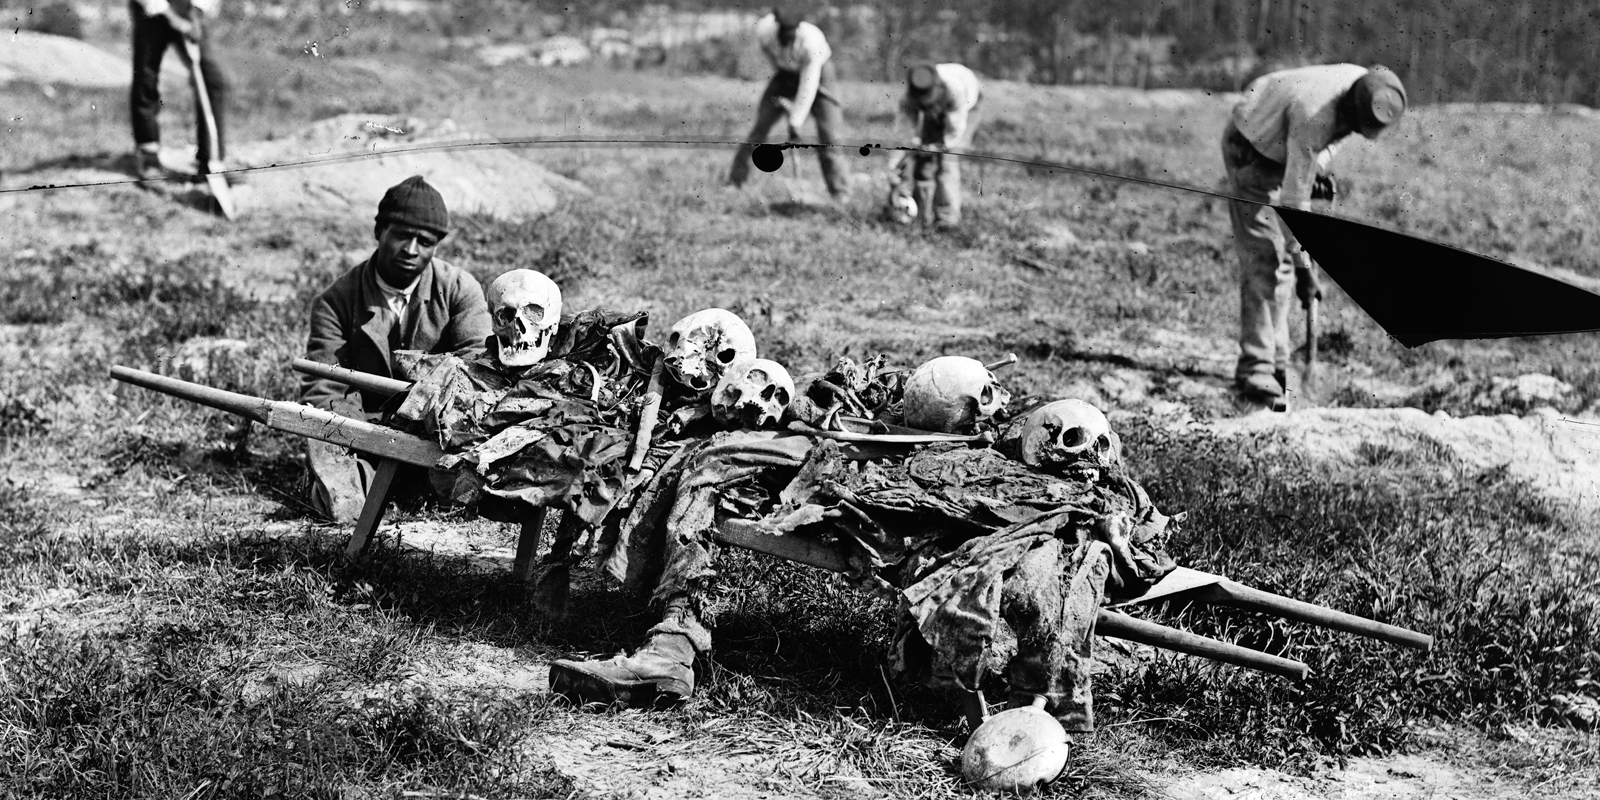 Collecting the Dead. Cold Harbor, Virginia. April, 1865. Via Library of Congress.